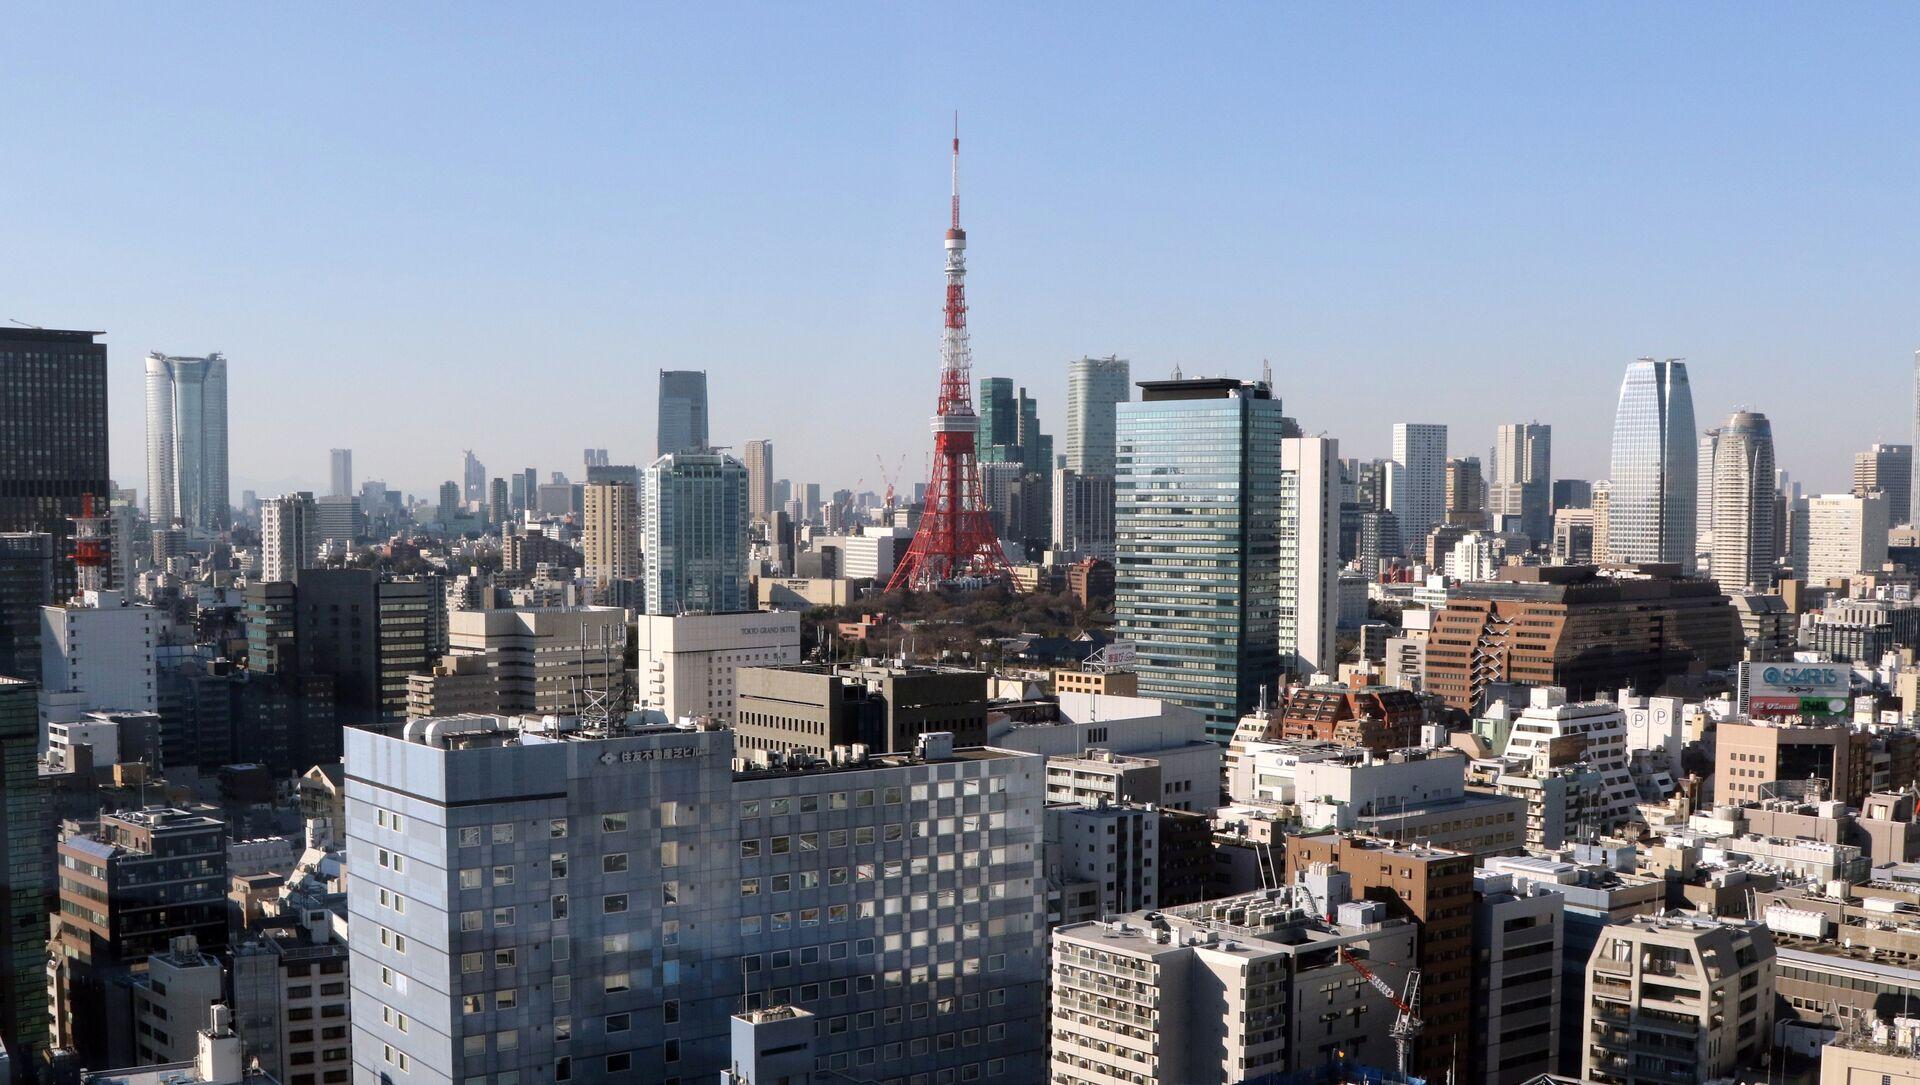 Skyline of central Tokyo - Sputnik International, 1920, 24.07.2021